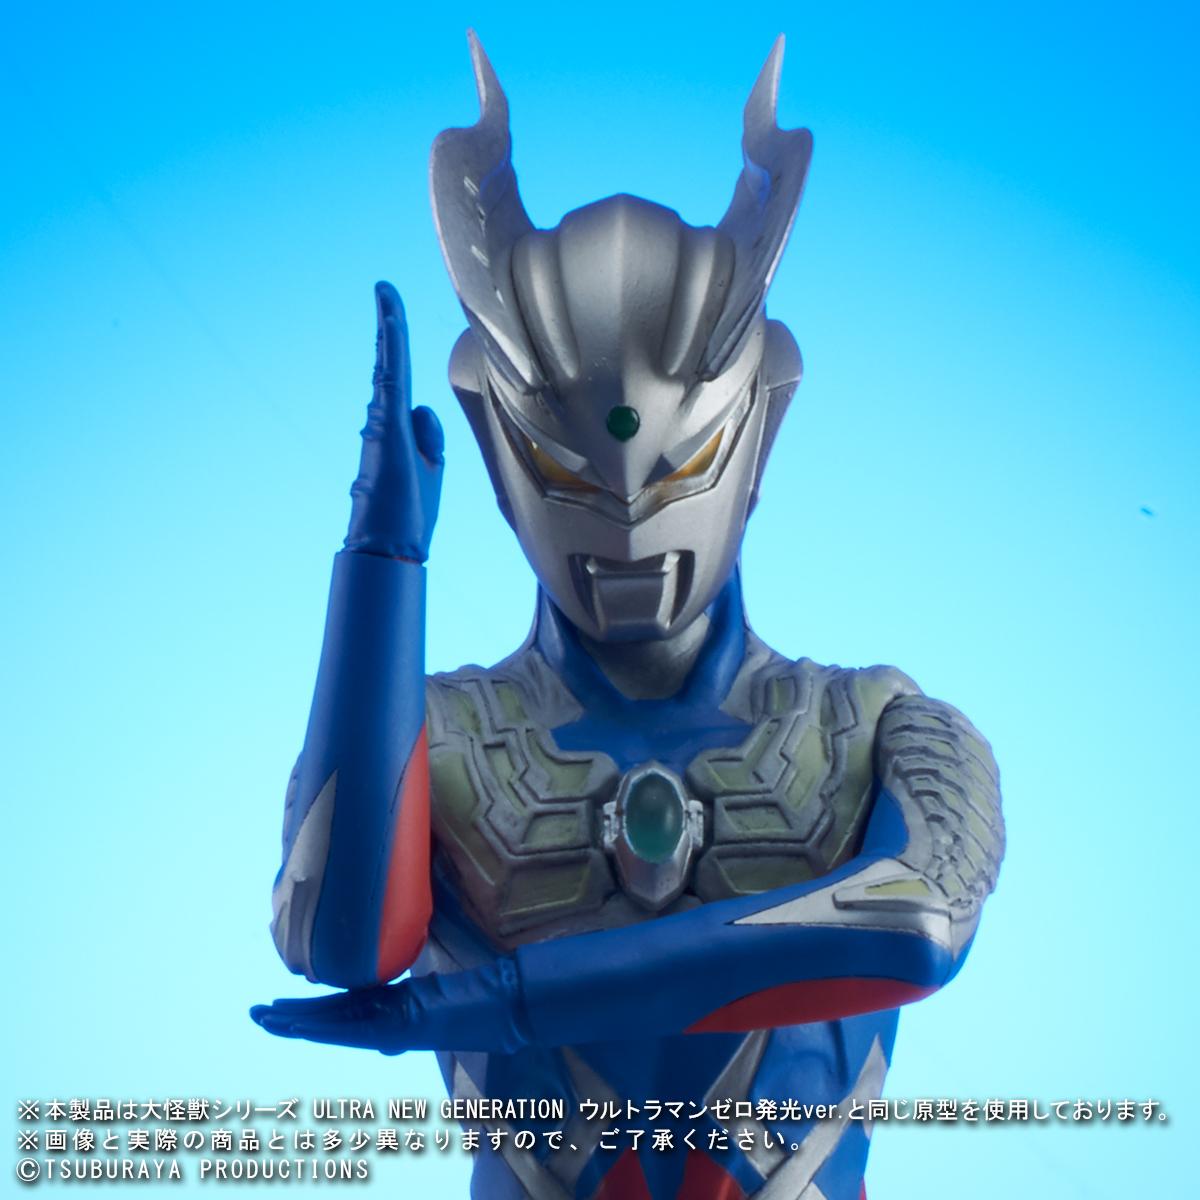 REAL MASTER COLLECTION PLUS Ultraman Zero